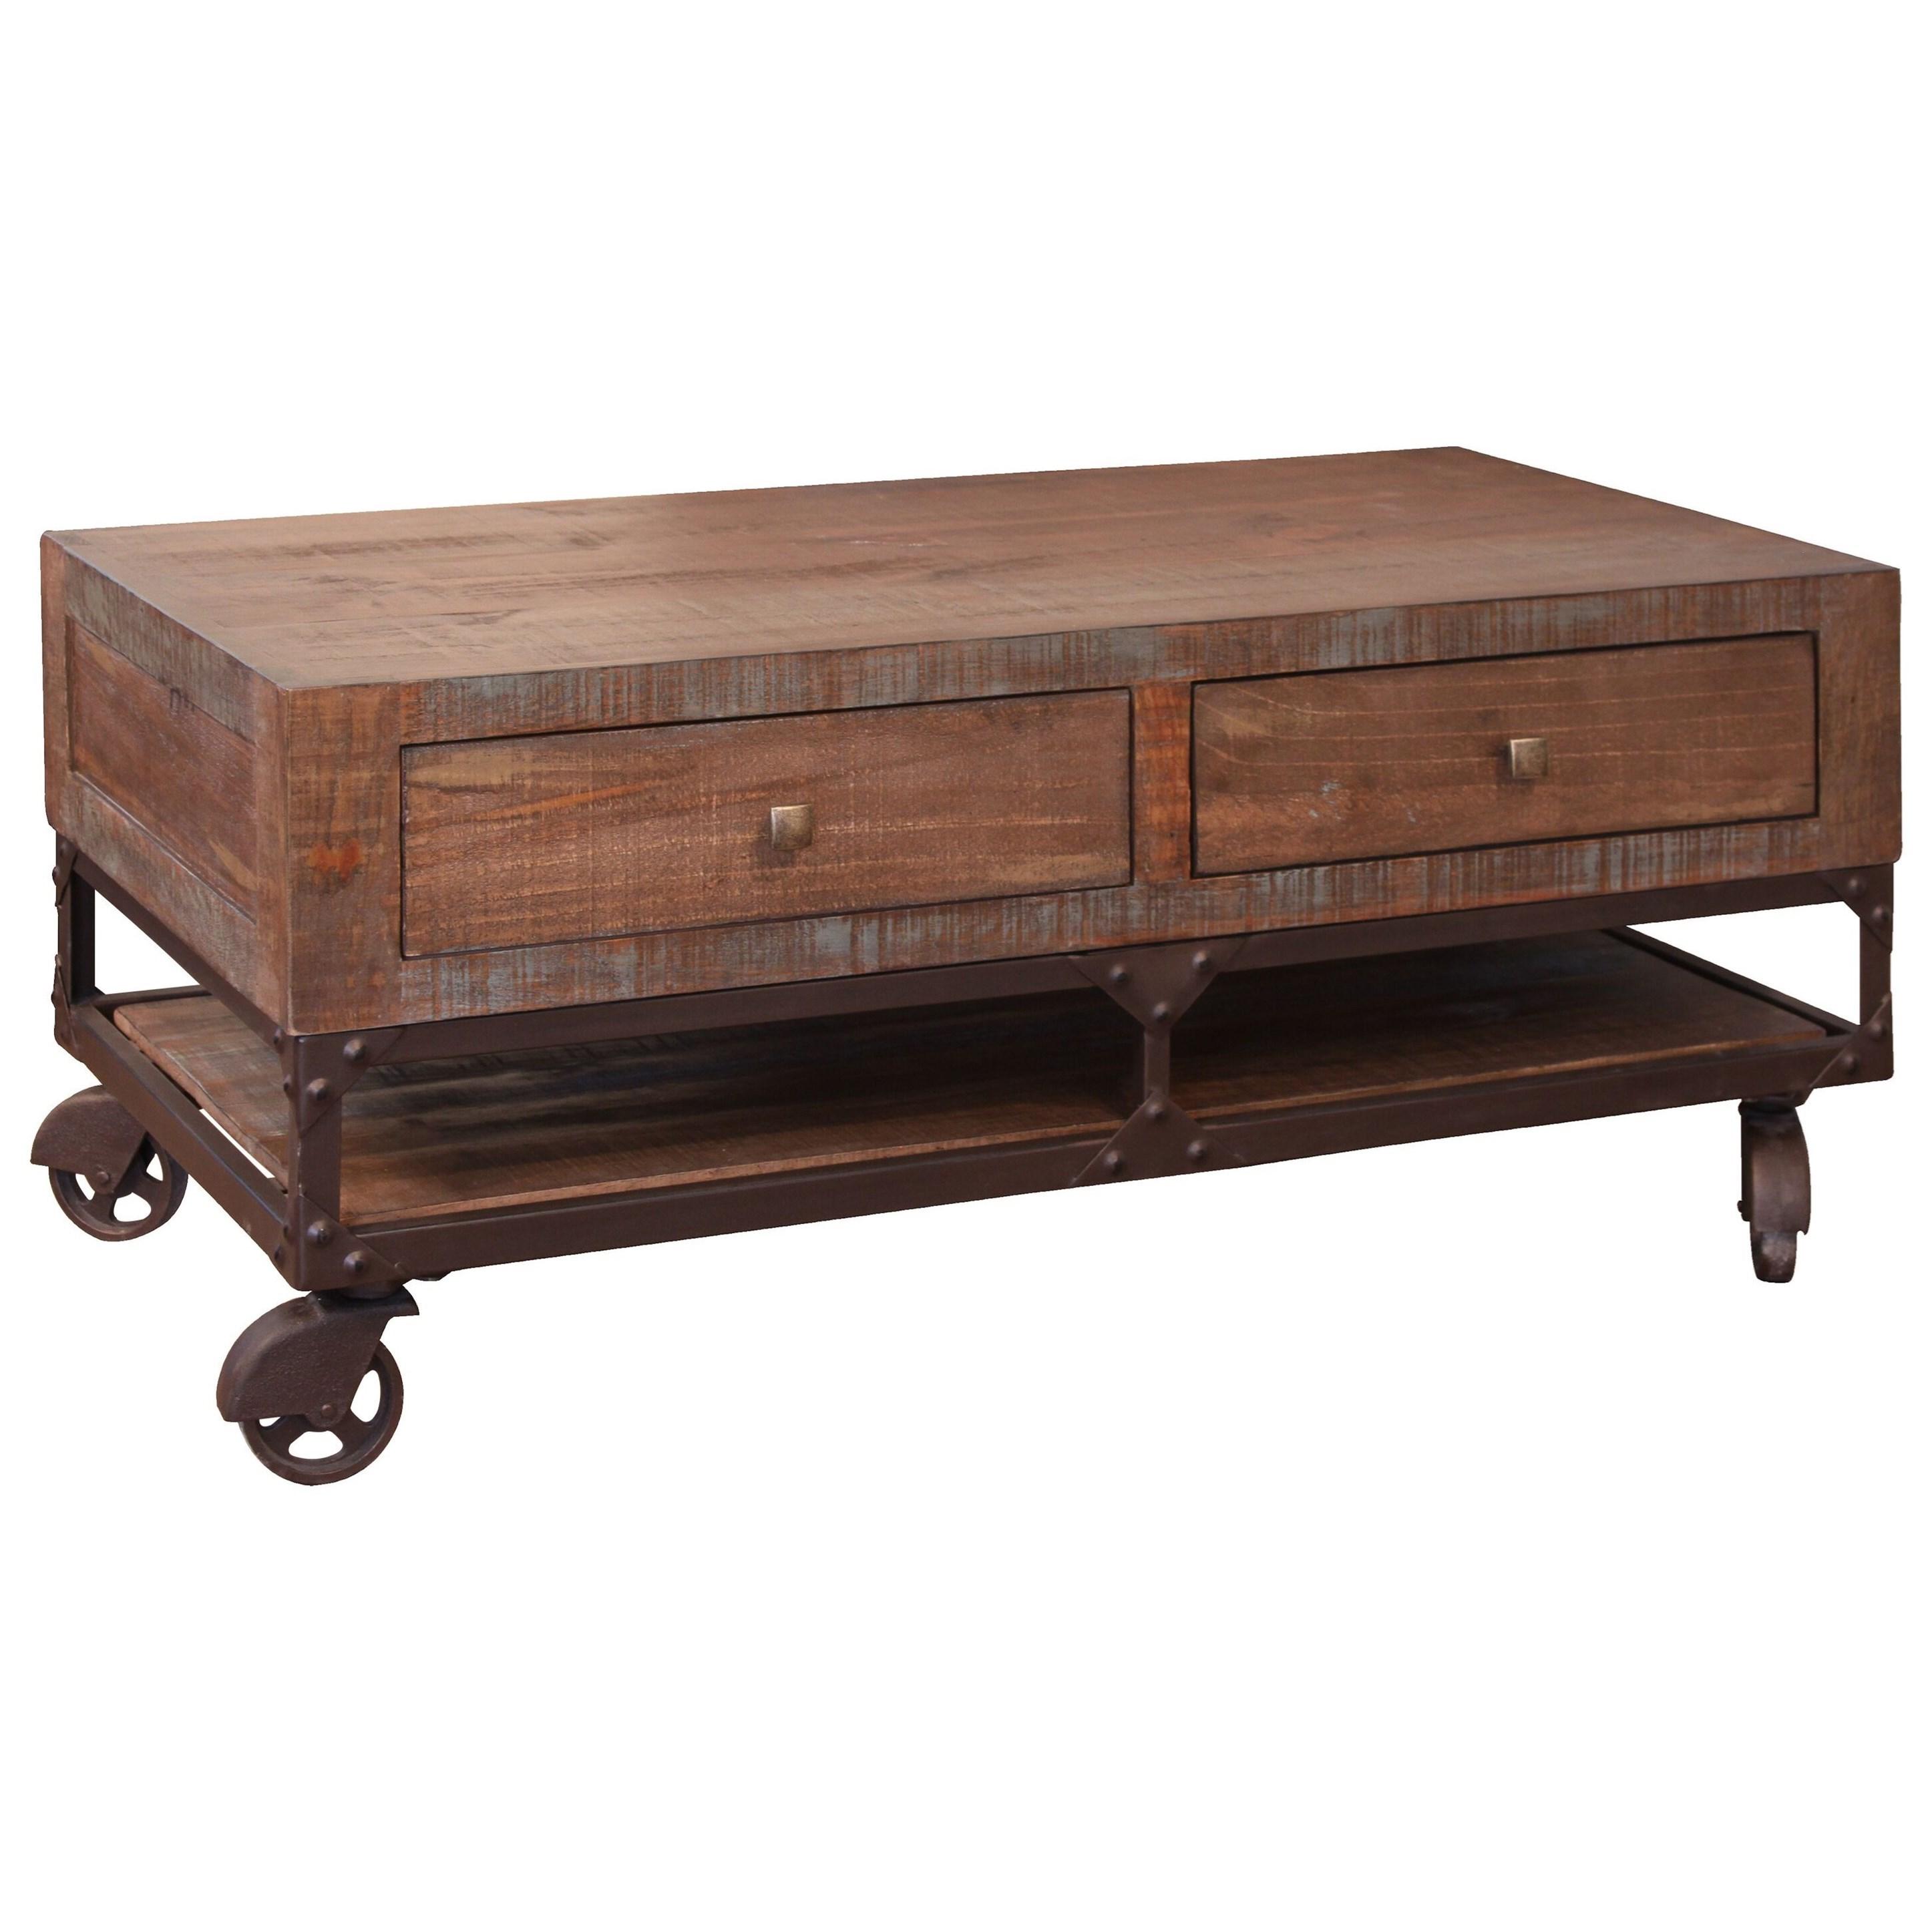 International Furniture Direct Urban Gold Ifd561cktl Rustic